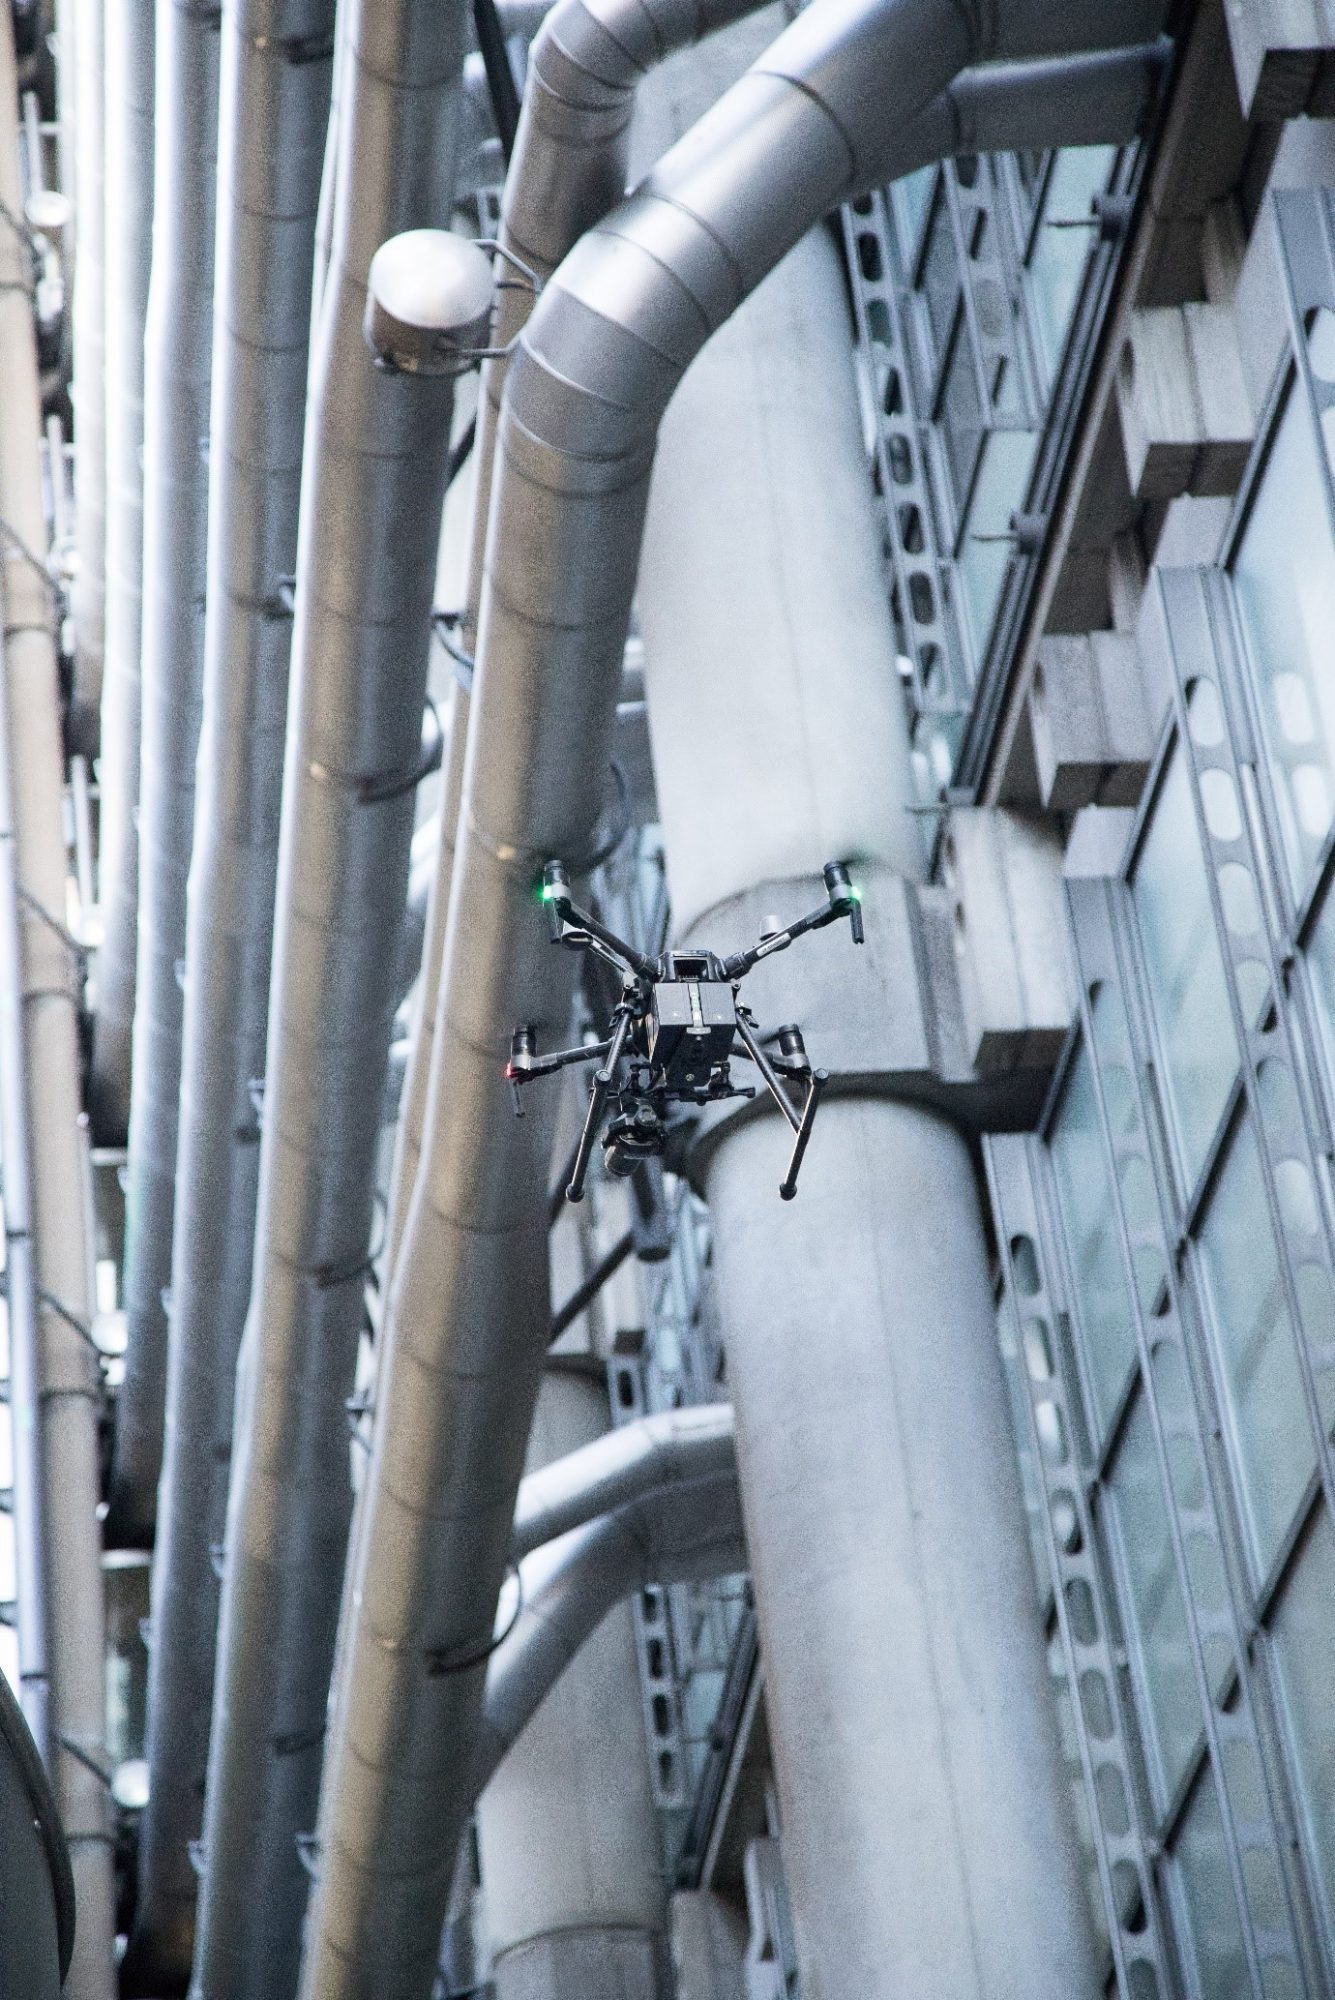 Drone surveying a London landmark